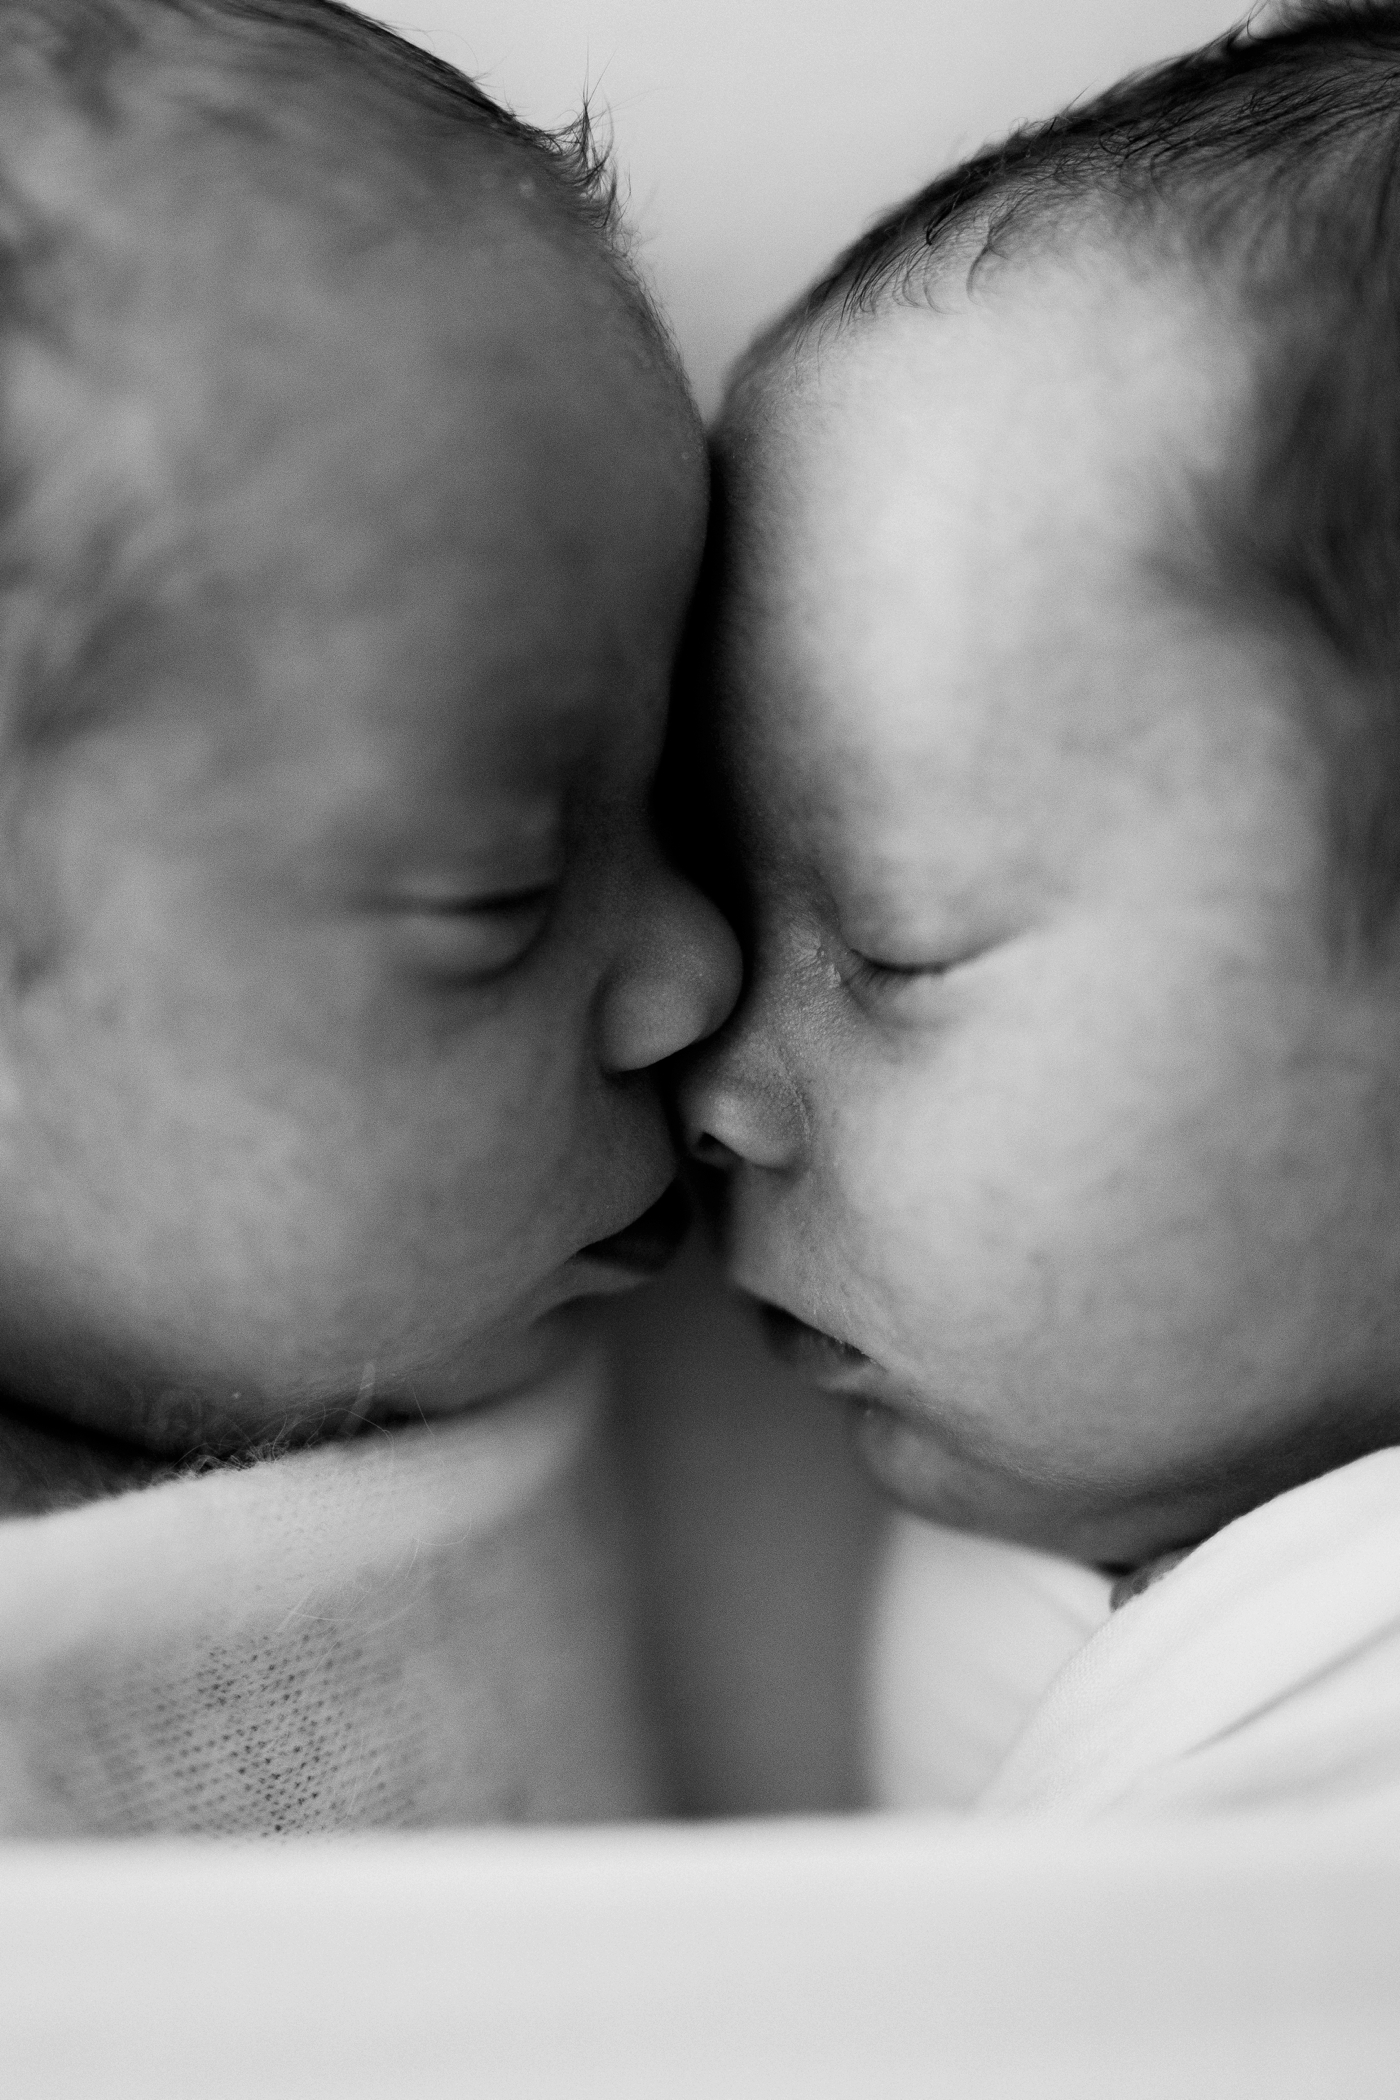 Buddy & Thomas - Twin newborn photographer in Adelaide - Twin newborn photography - Natural newborn photographer - www.katherineschultzphotography.com 10